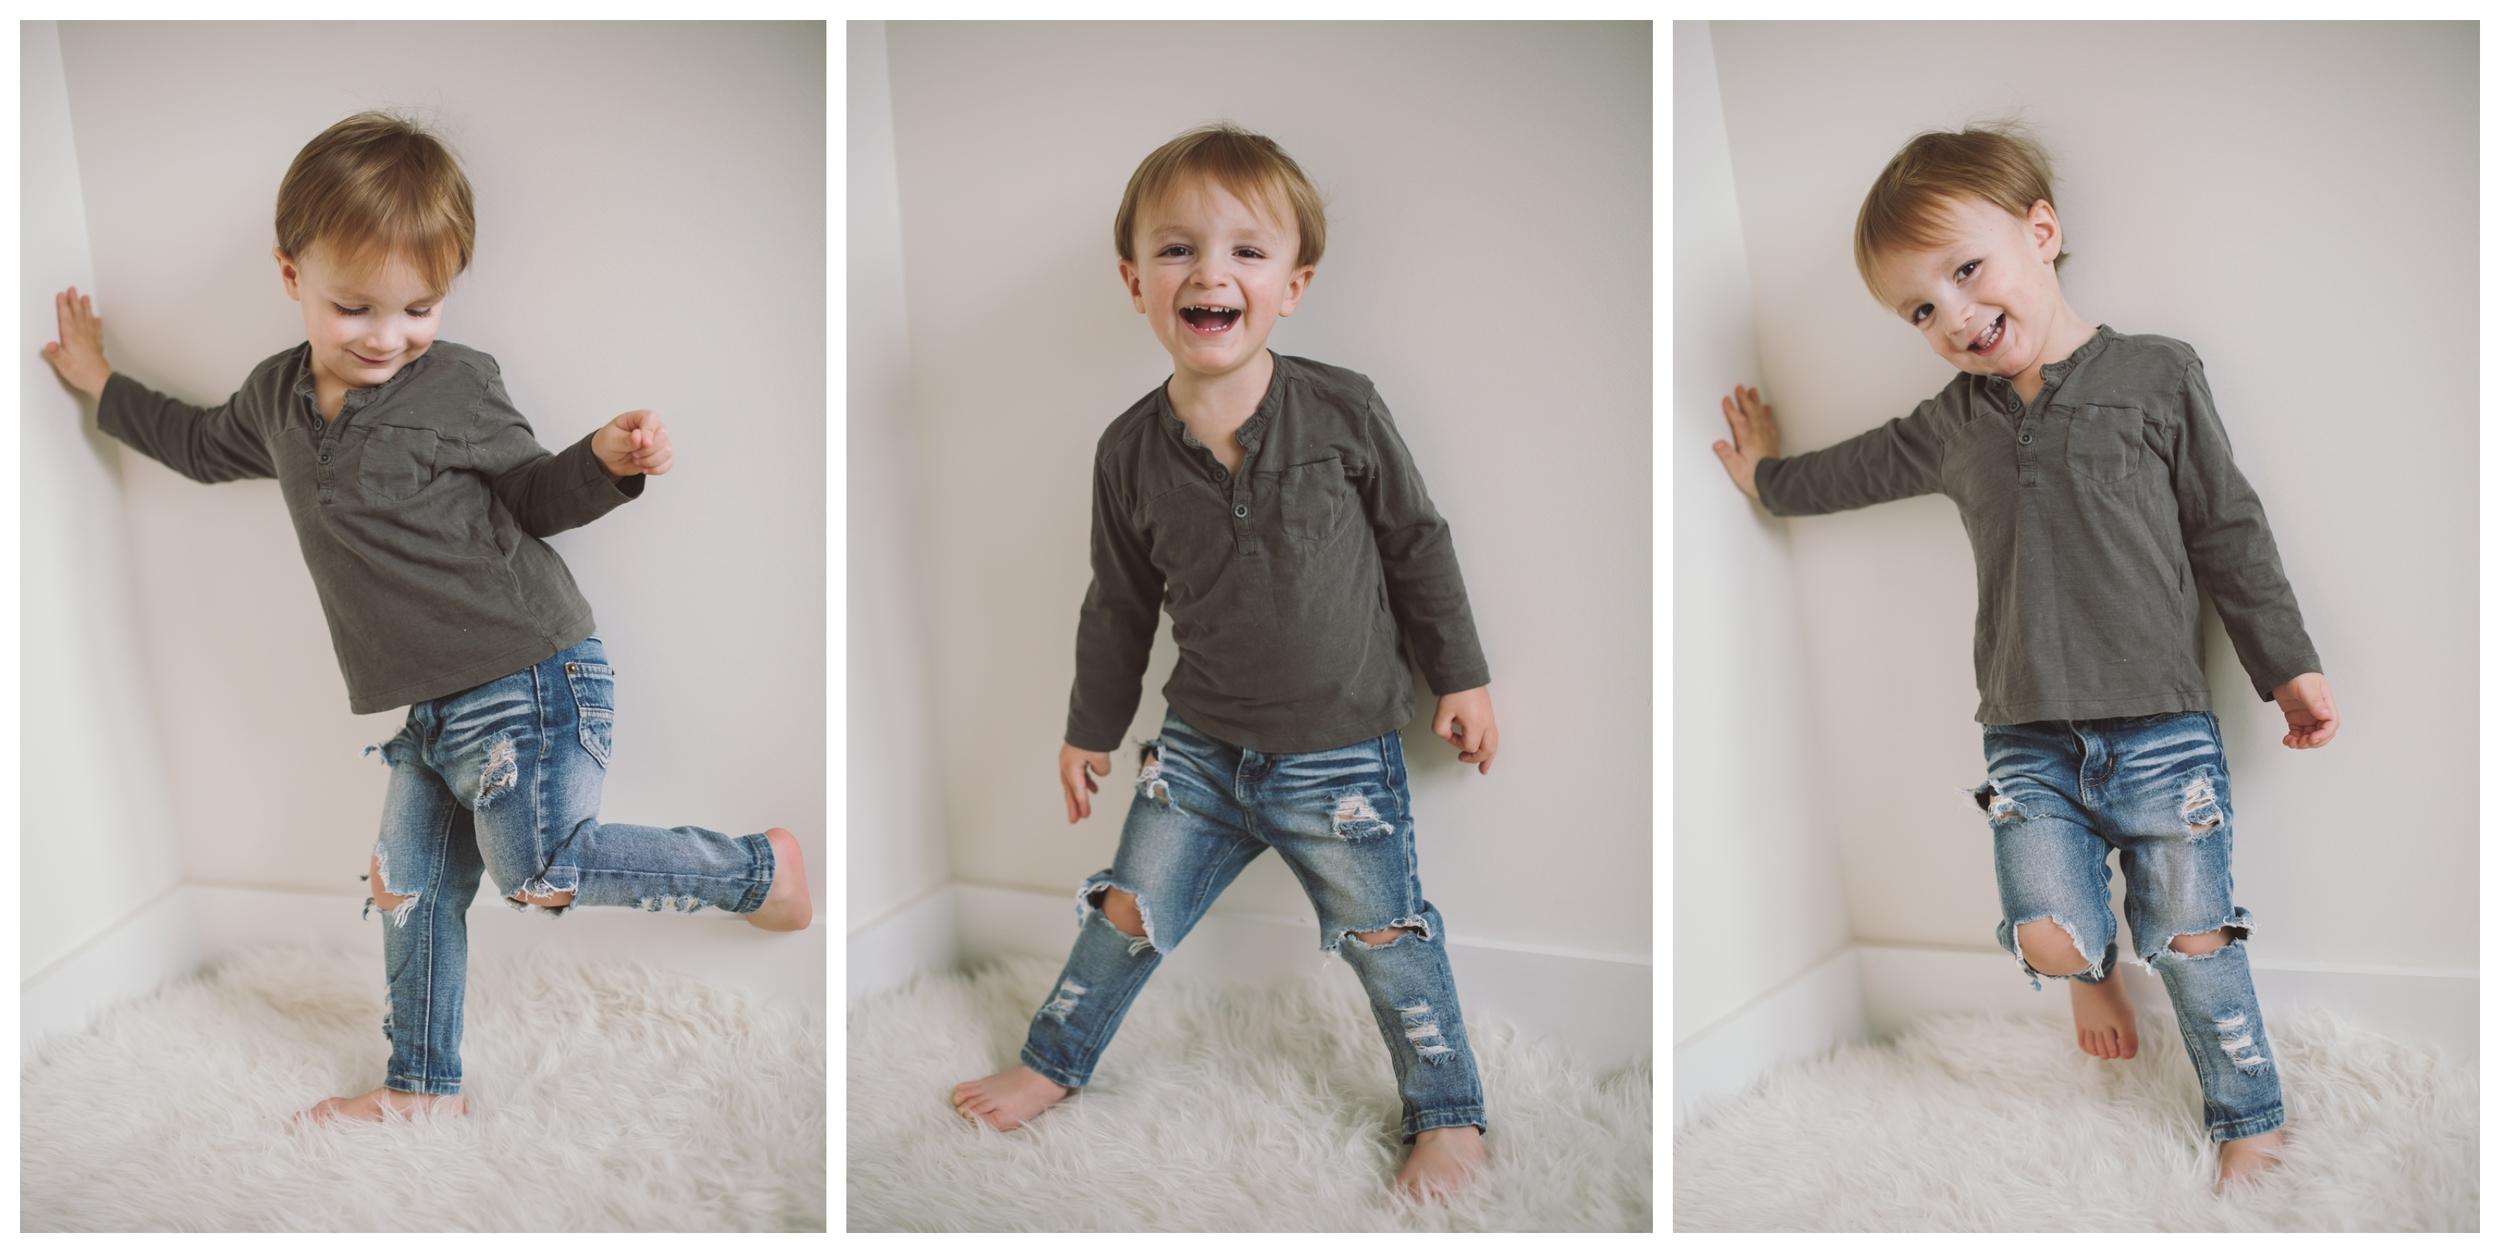 jeans:  susie's custom . less distress skinny fit.